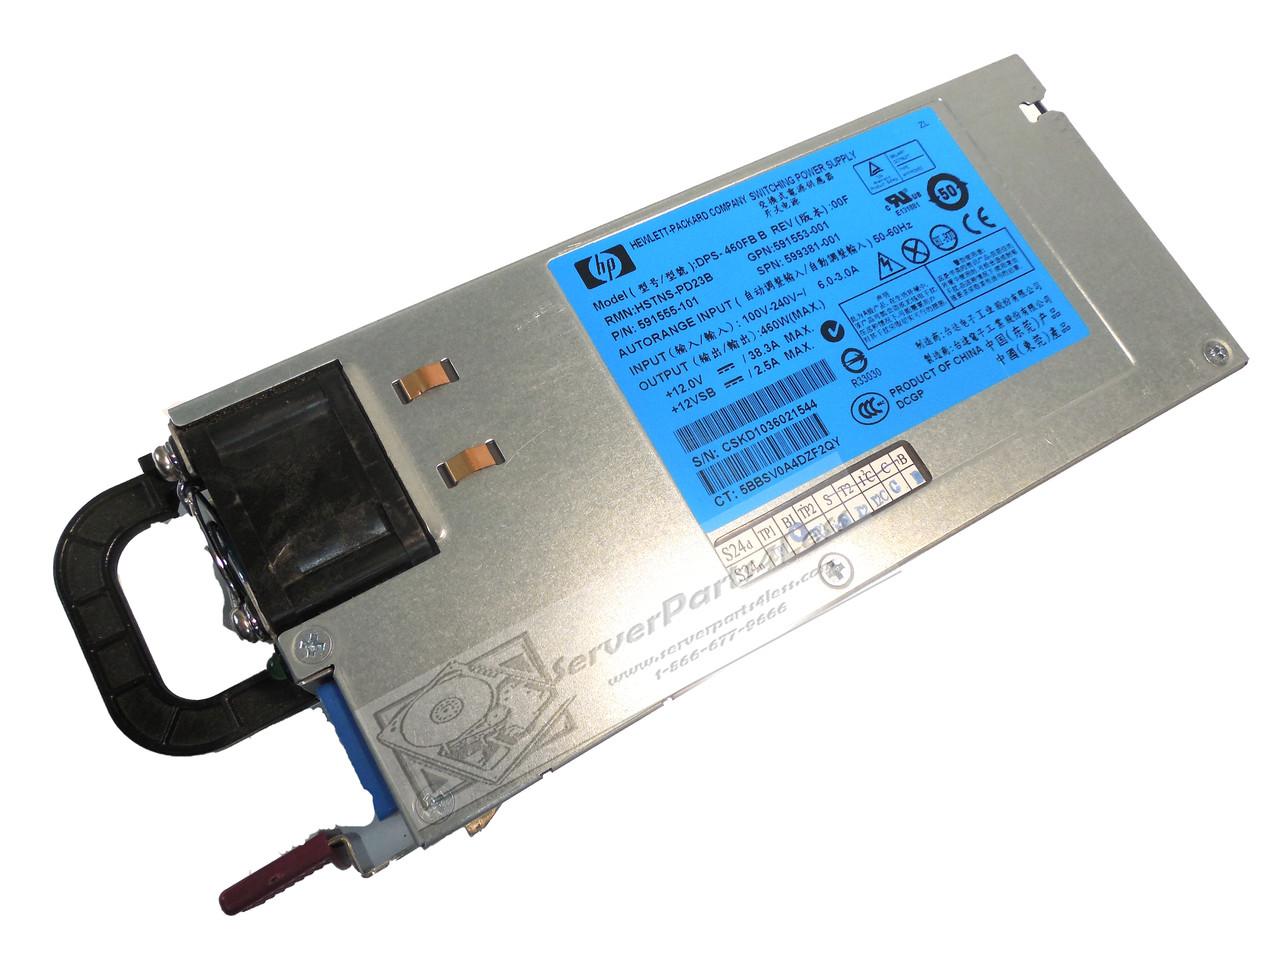 HP 660184-001 Platinum Plus Hot Swap 460W Switching Power Supply Free Ship